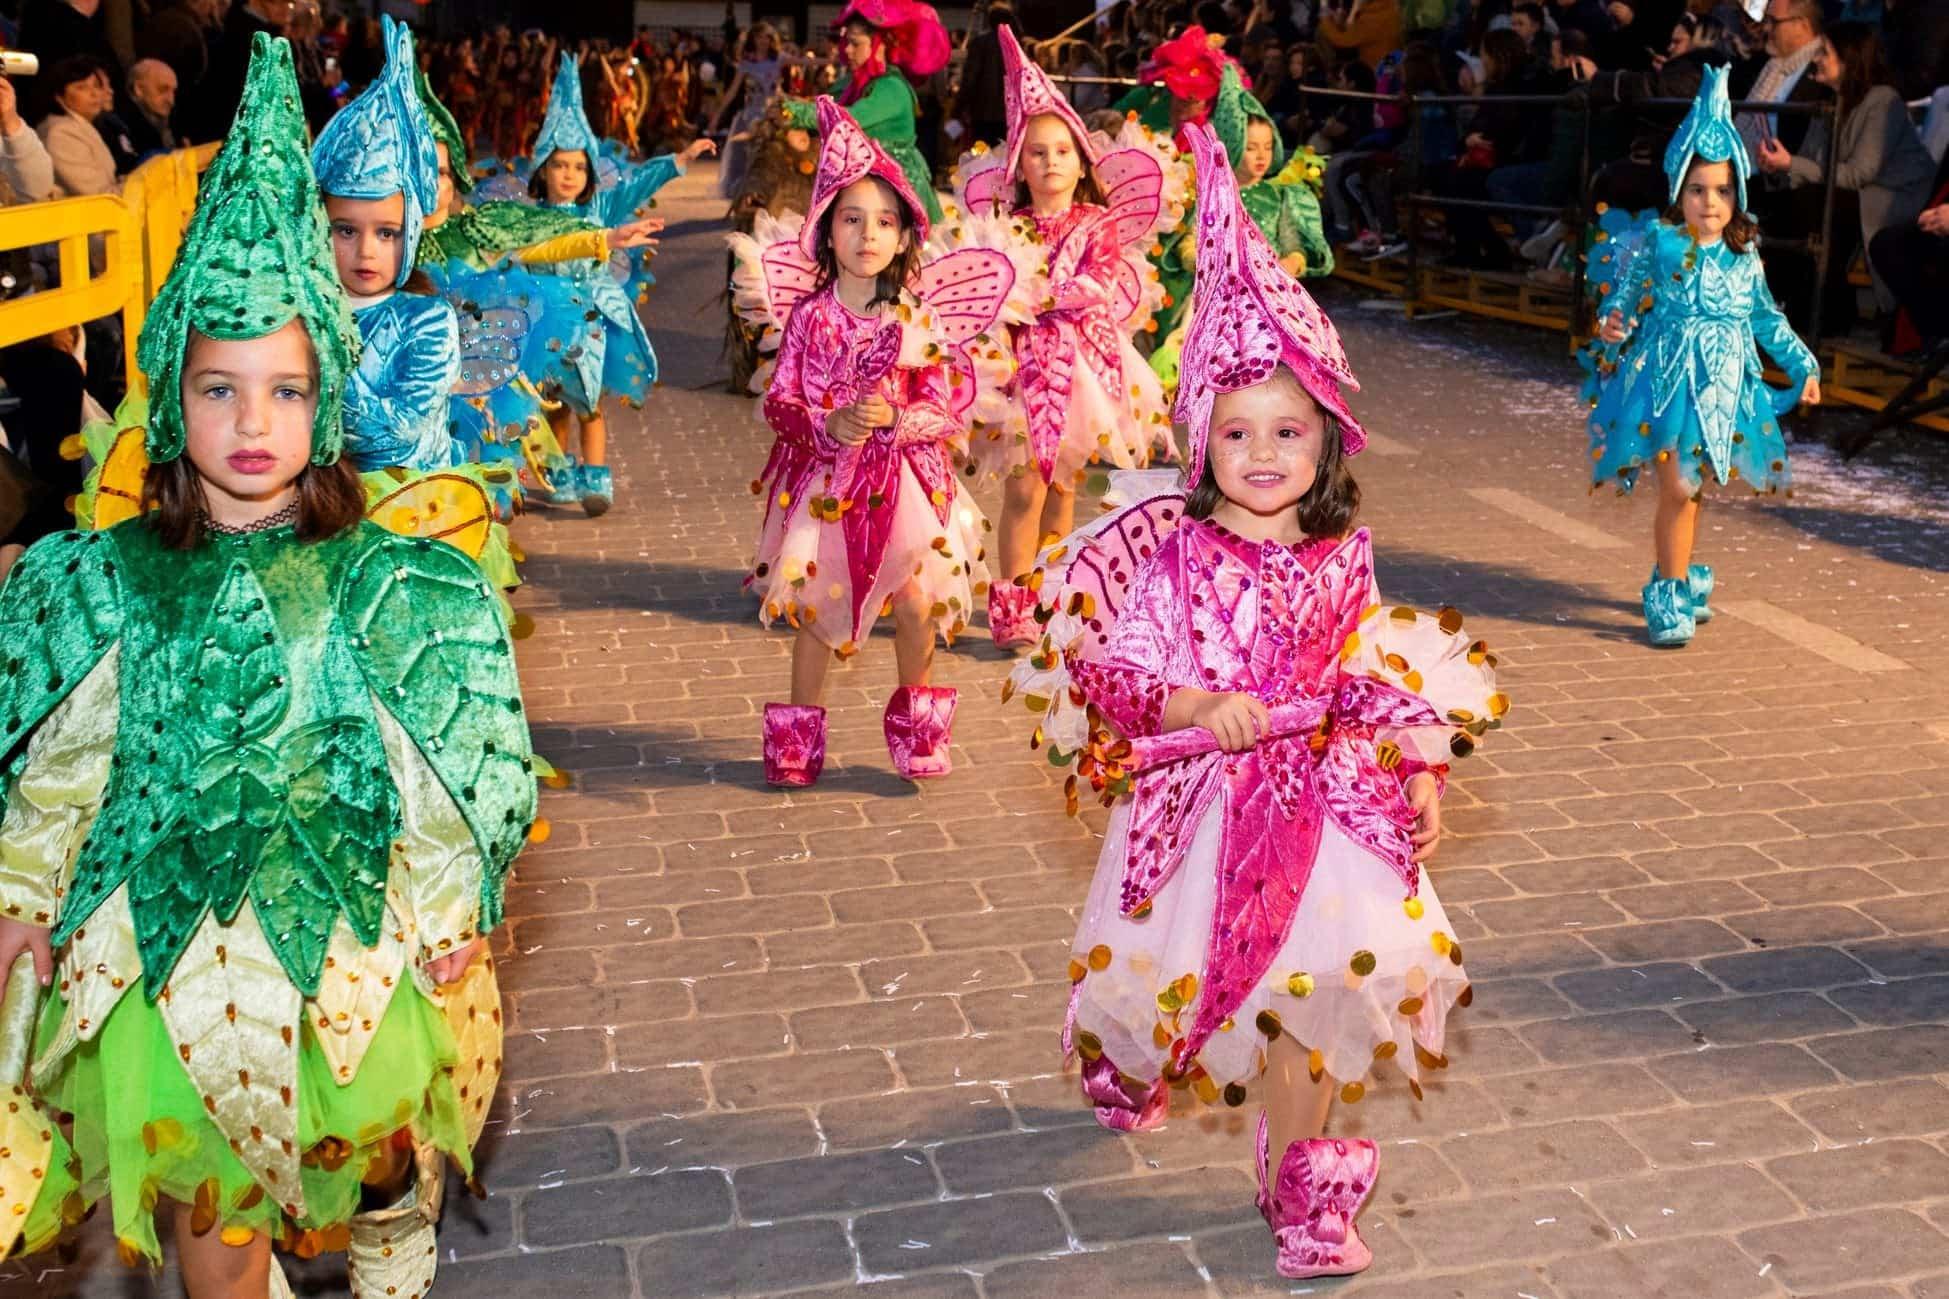 Carnaval de herencia 2020 ofertorio 159 - Selección de fotografías del Ofertorio del Carnaval de Herencia